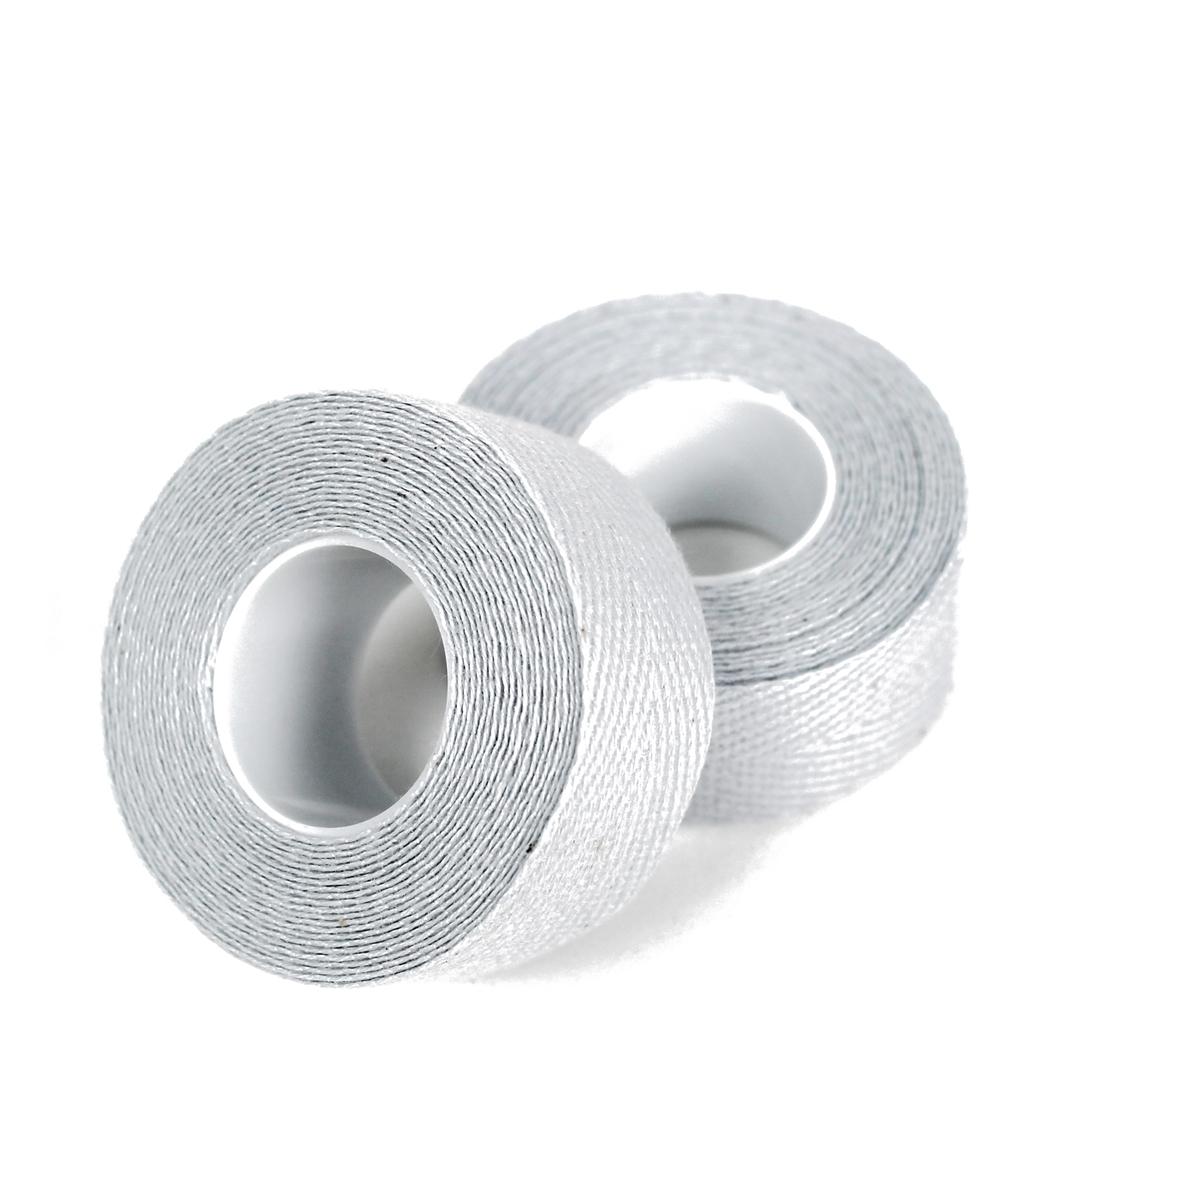 Pair cotton vintage retrò handlebar tape white